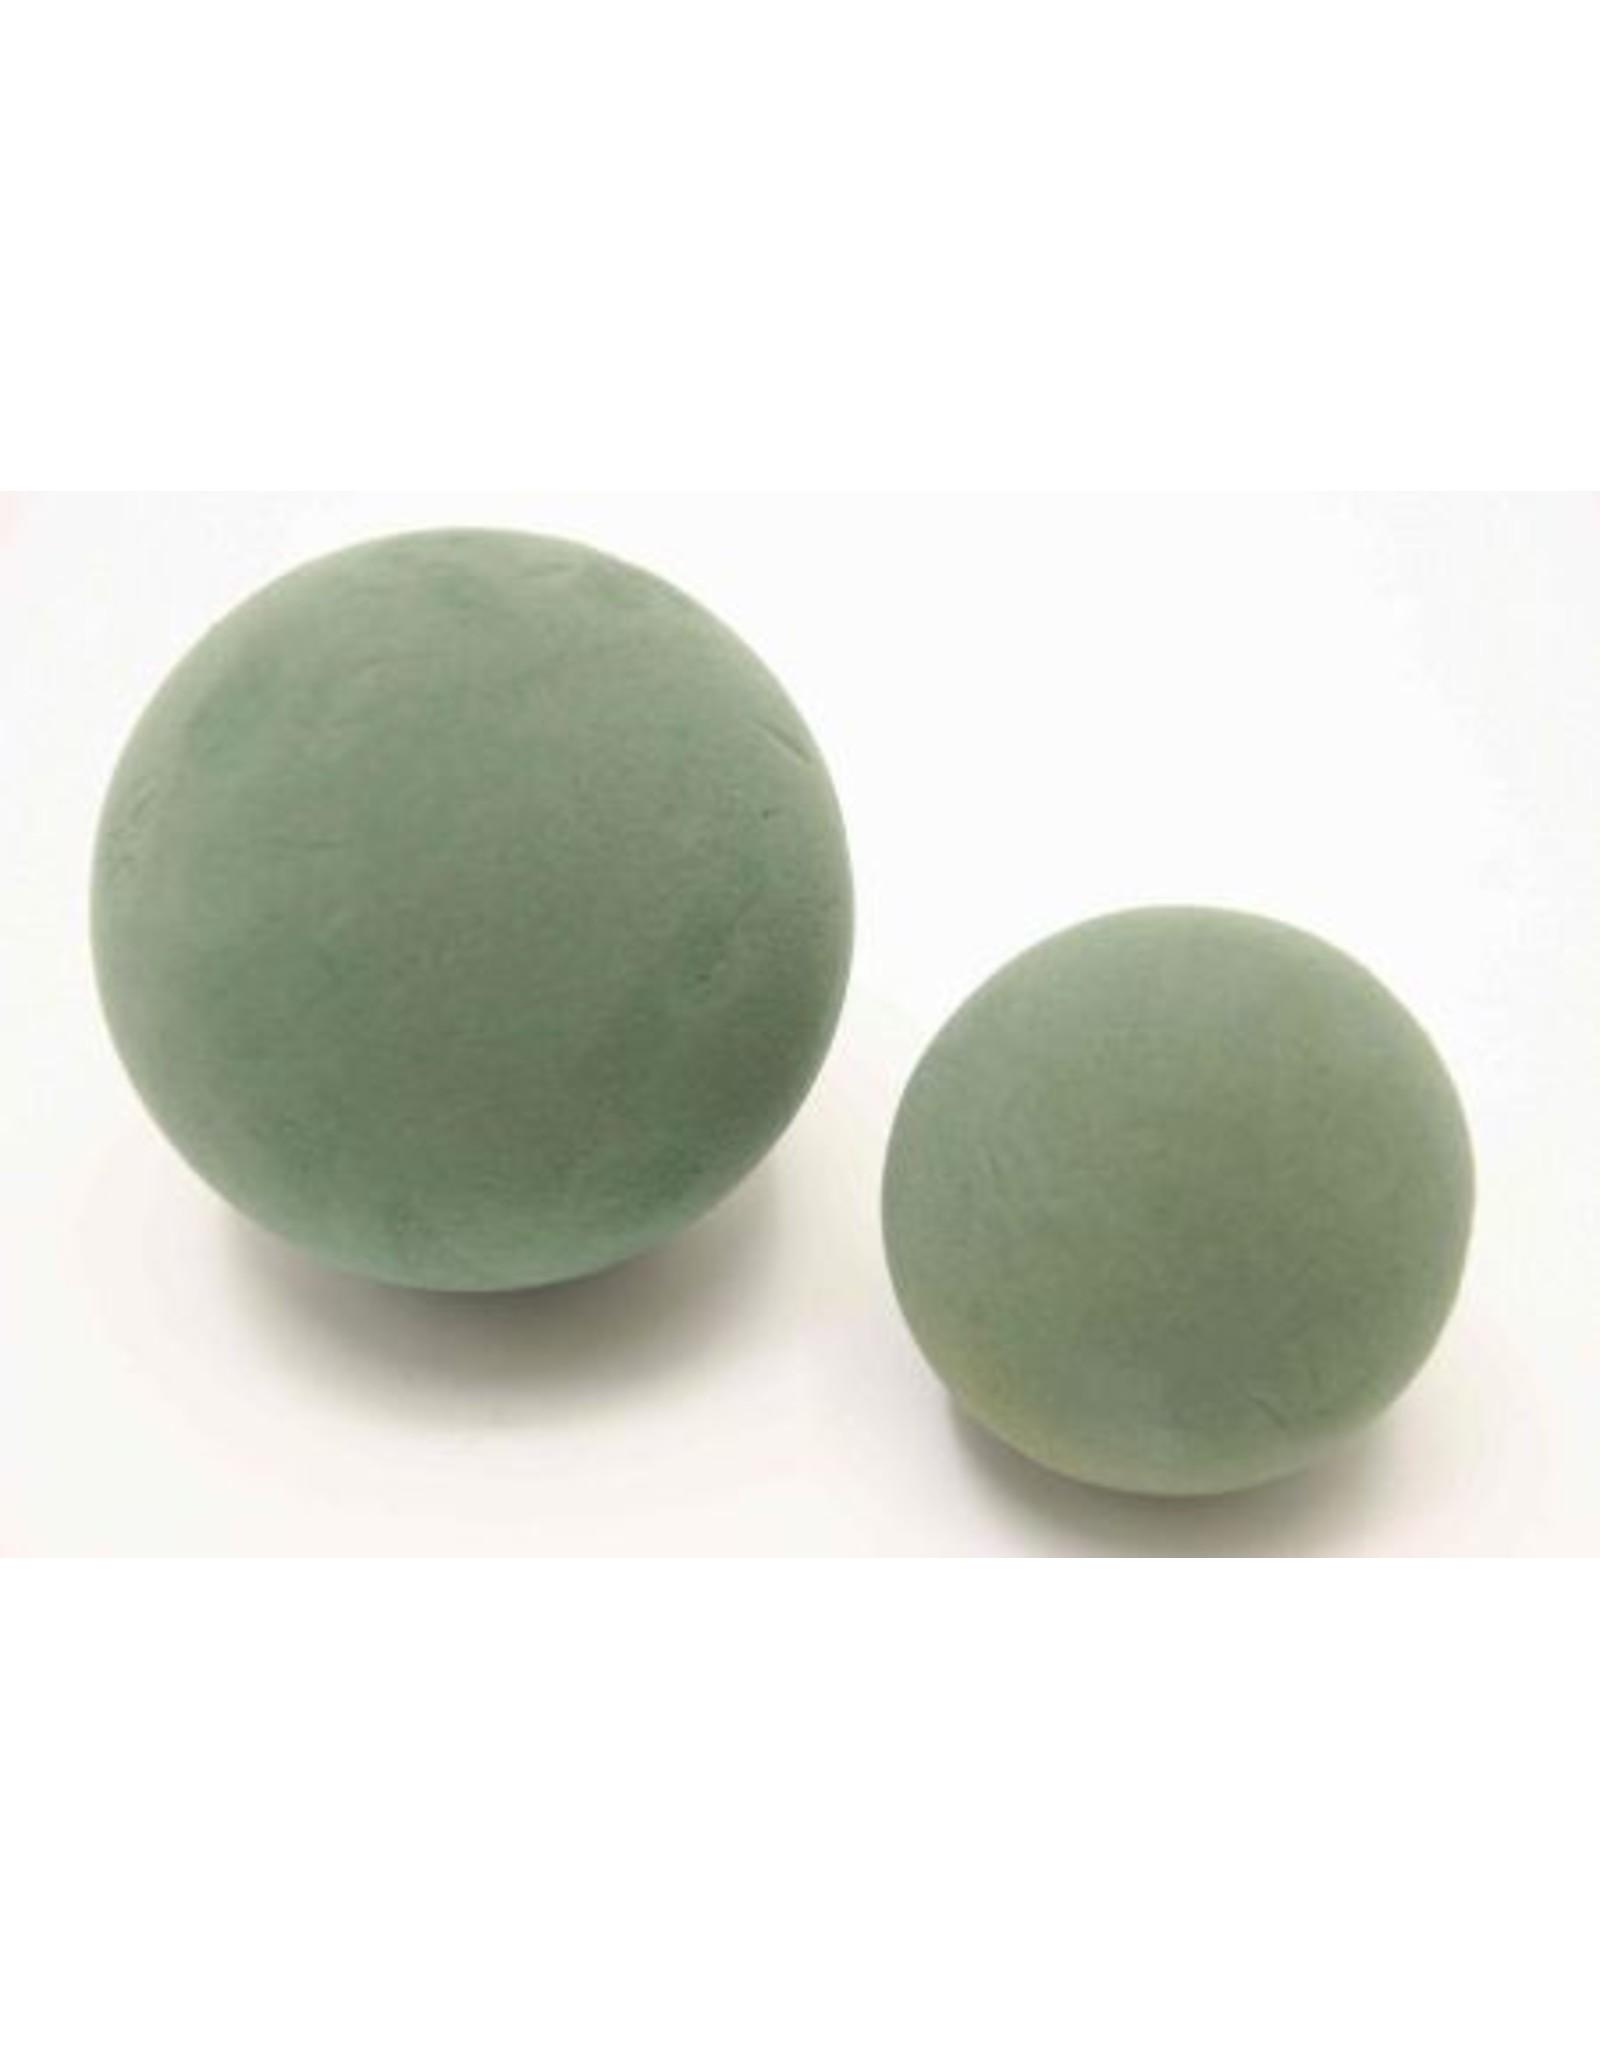 HD Basic Ball Sld Foam D15.0 x 12